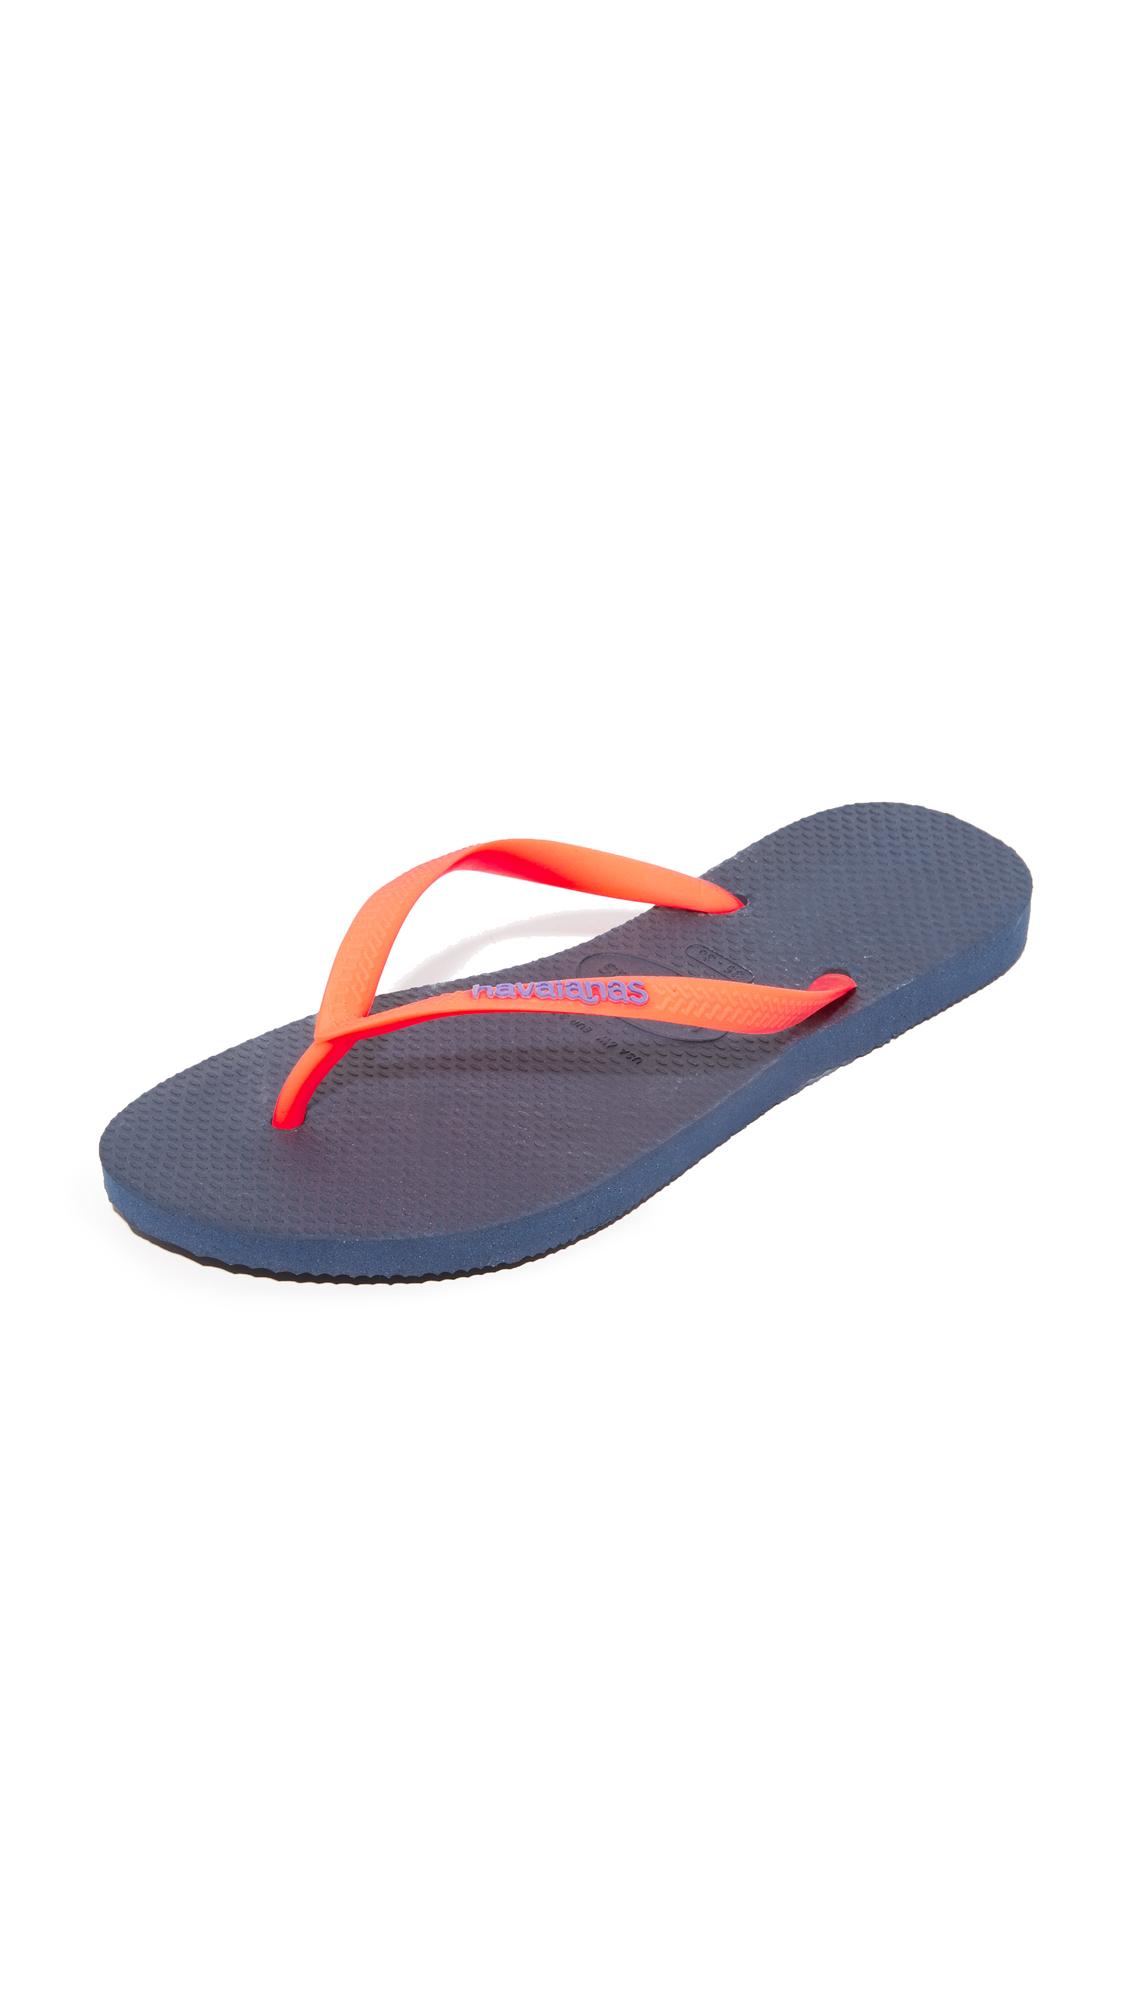 Havaianas Slim Logo Pop-Up Flip Flops - Navy Blue at Shopbop